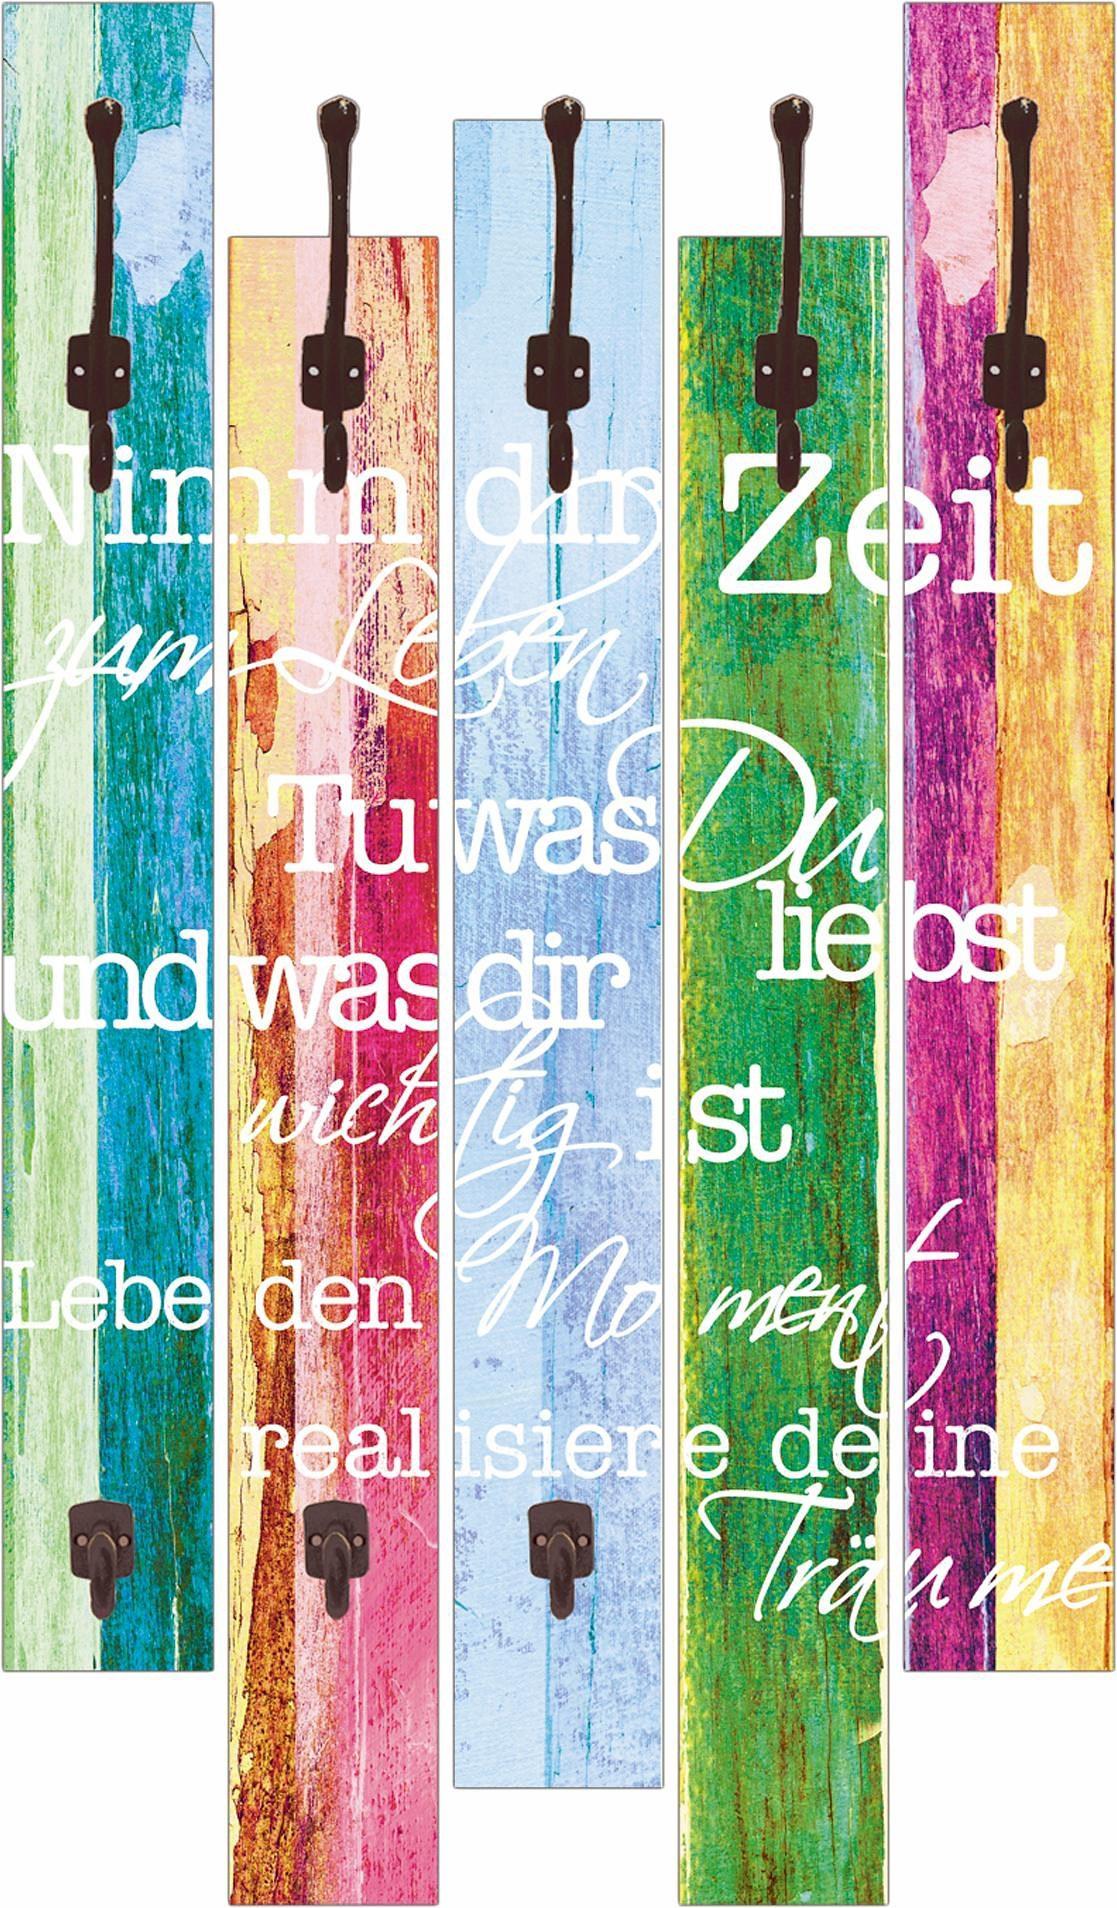 Home affaire Garderobe »Jule: Nimm dir Zeit« 68/114 cm